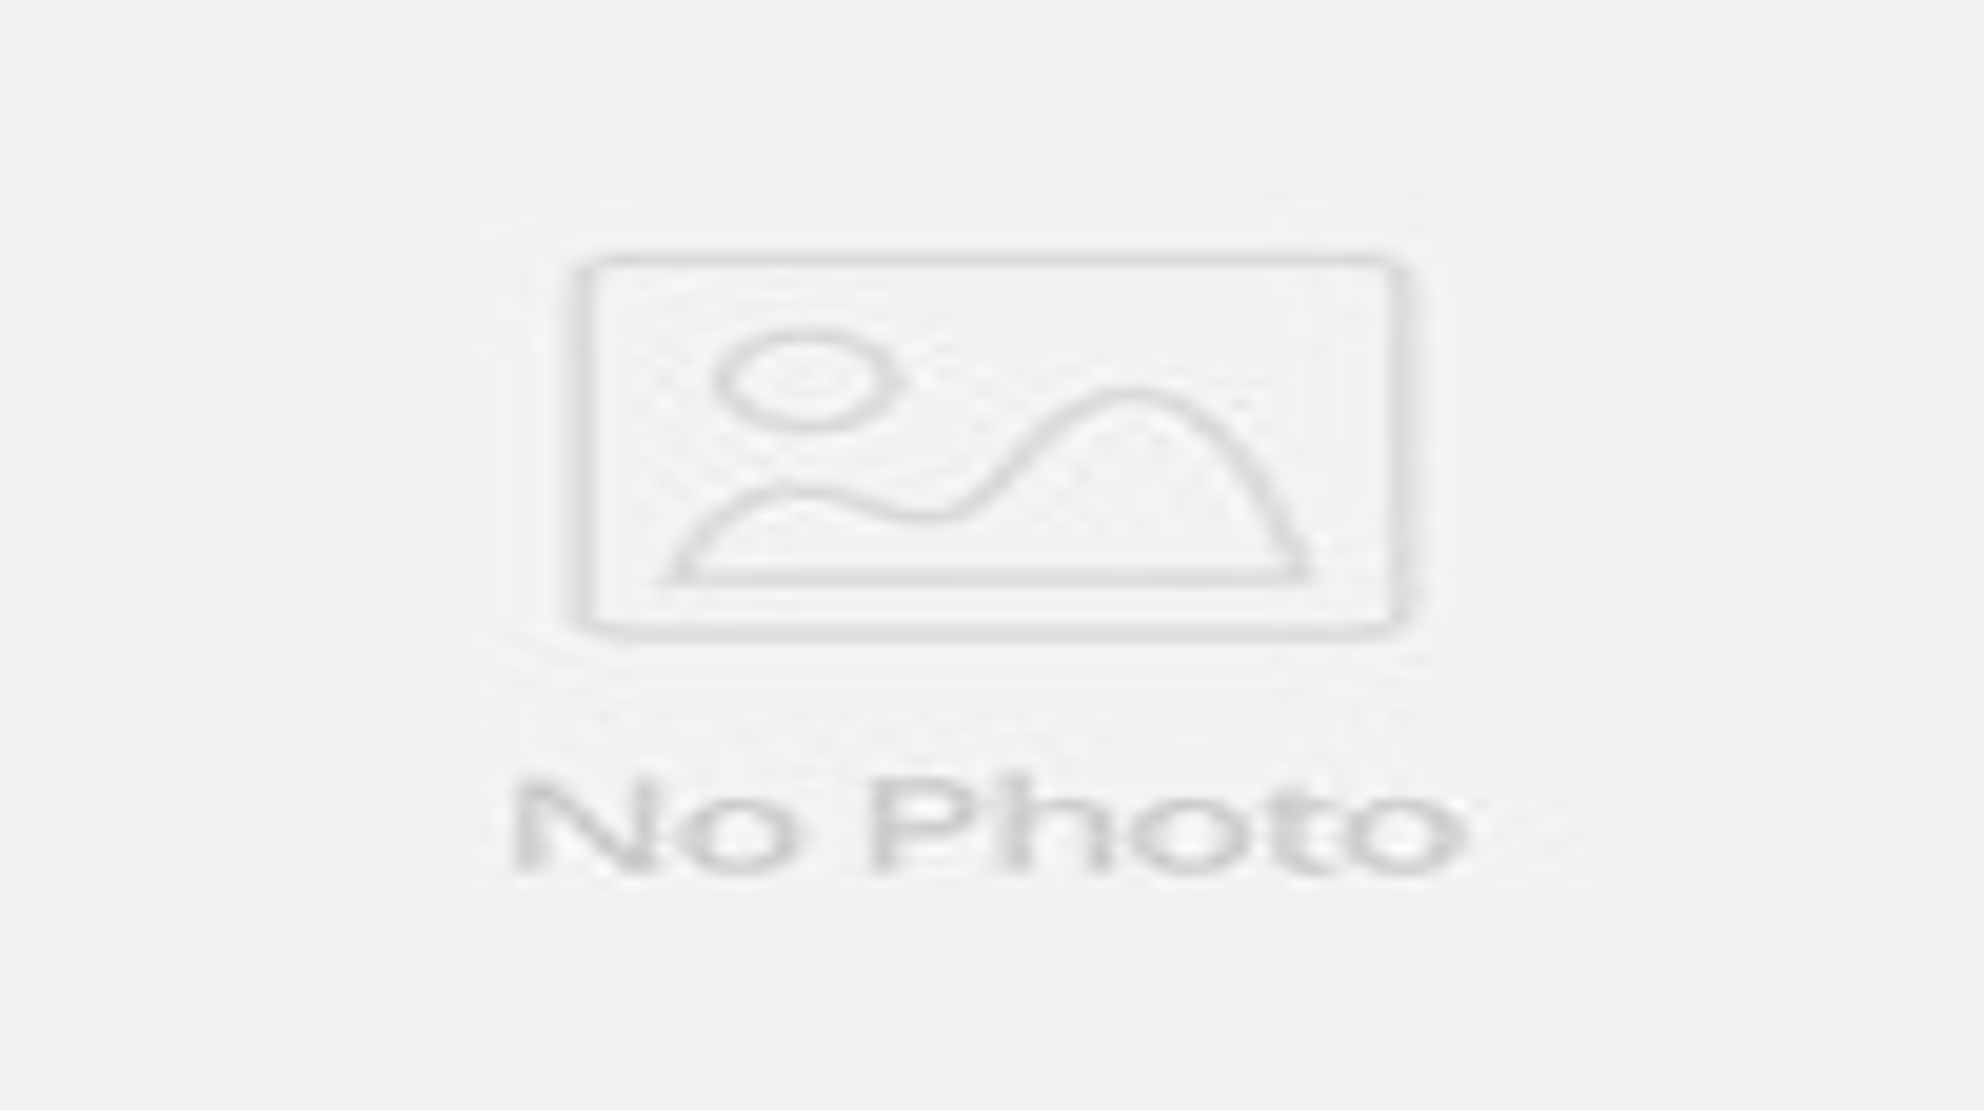 alles unterm sofa wer weiss. Black Bedroom Furniture Sets. Home Design Ideas